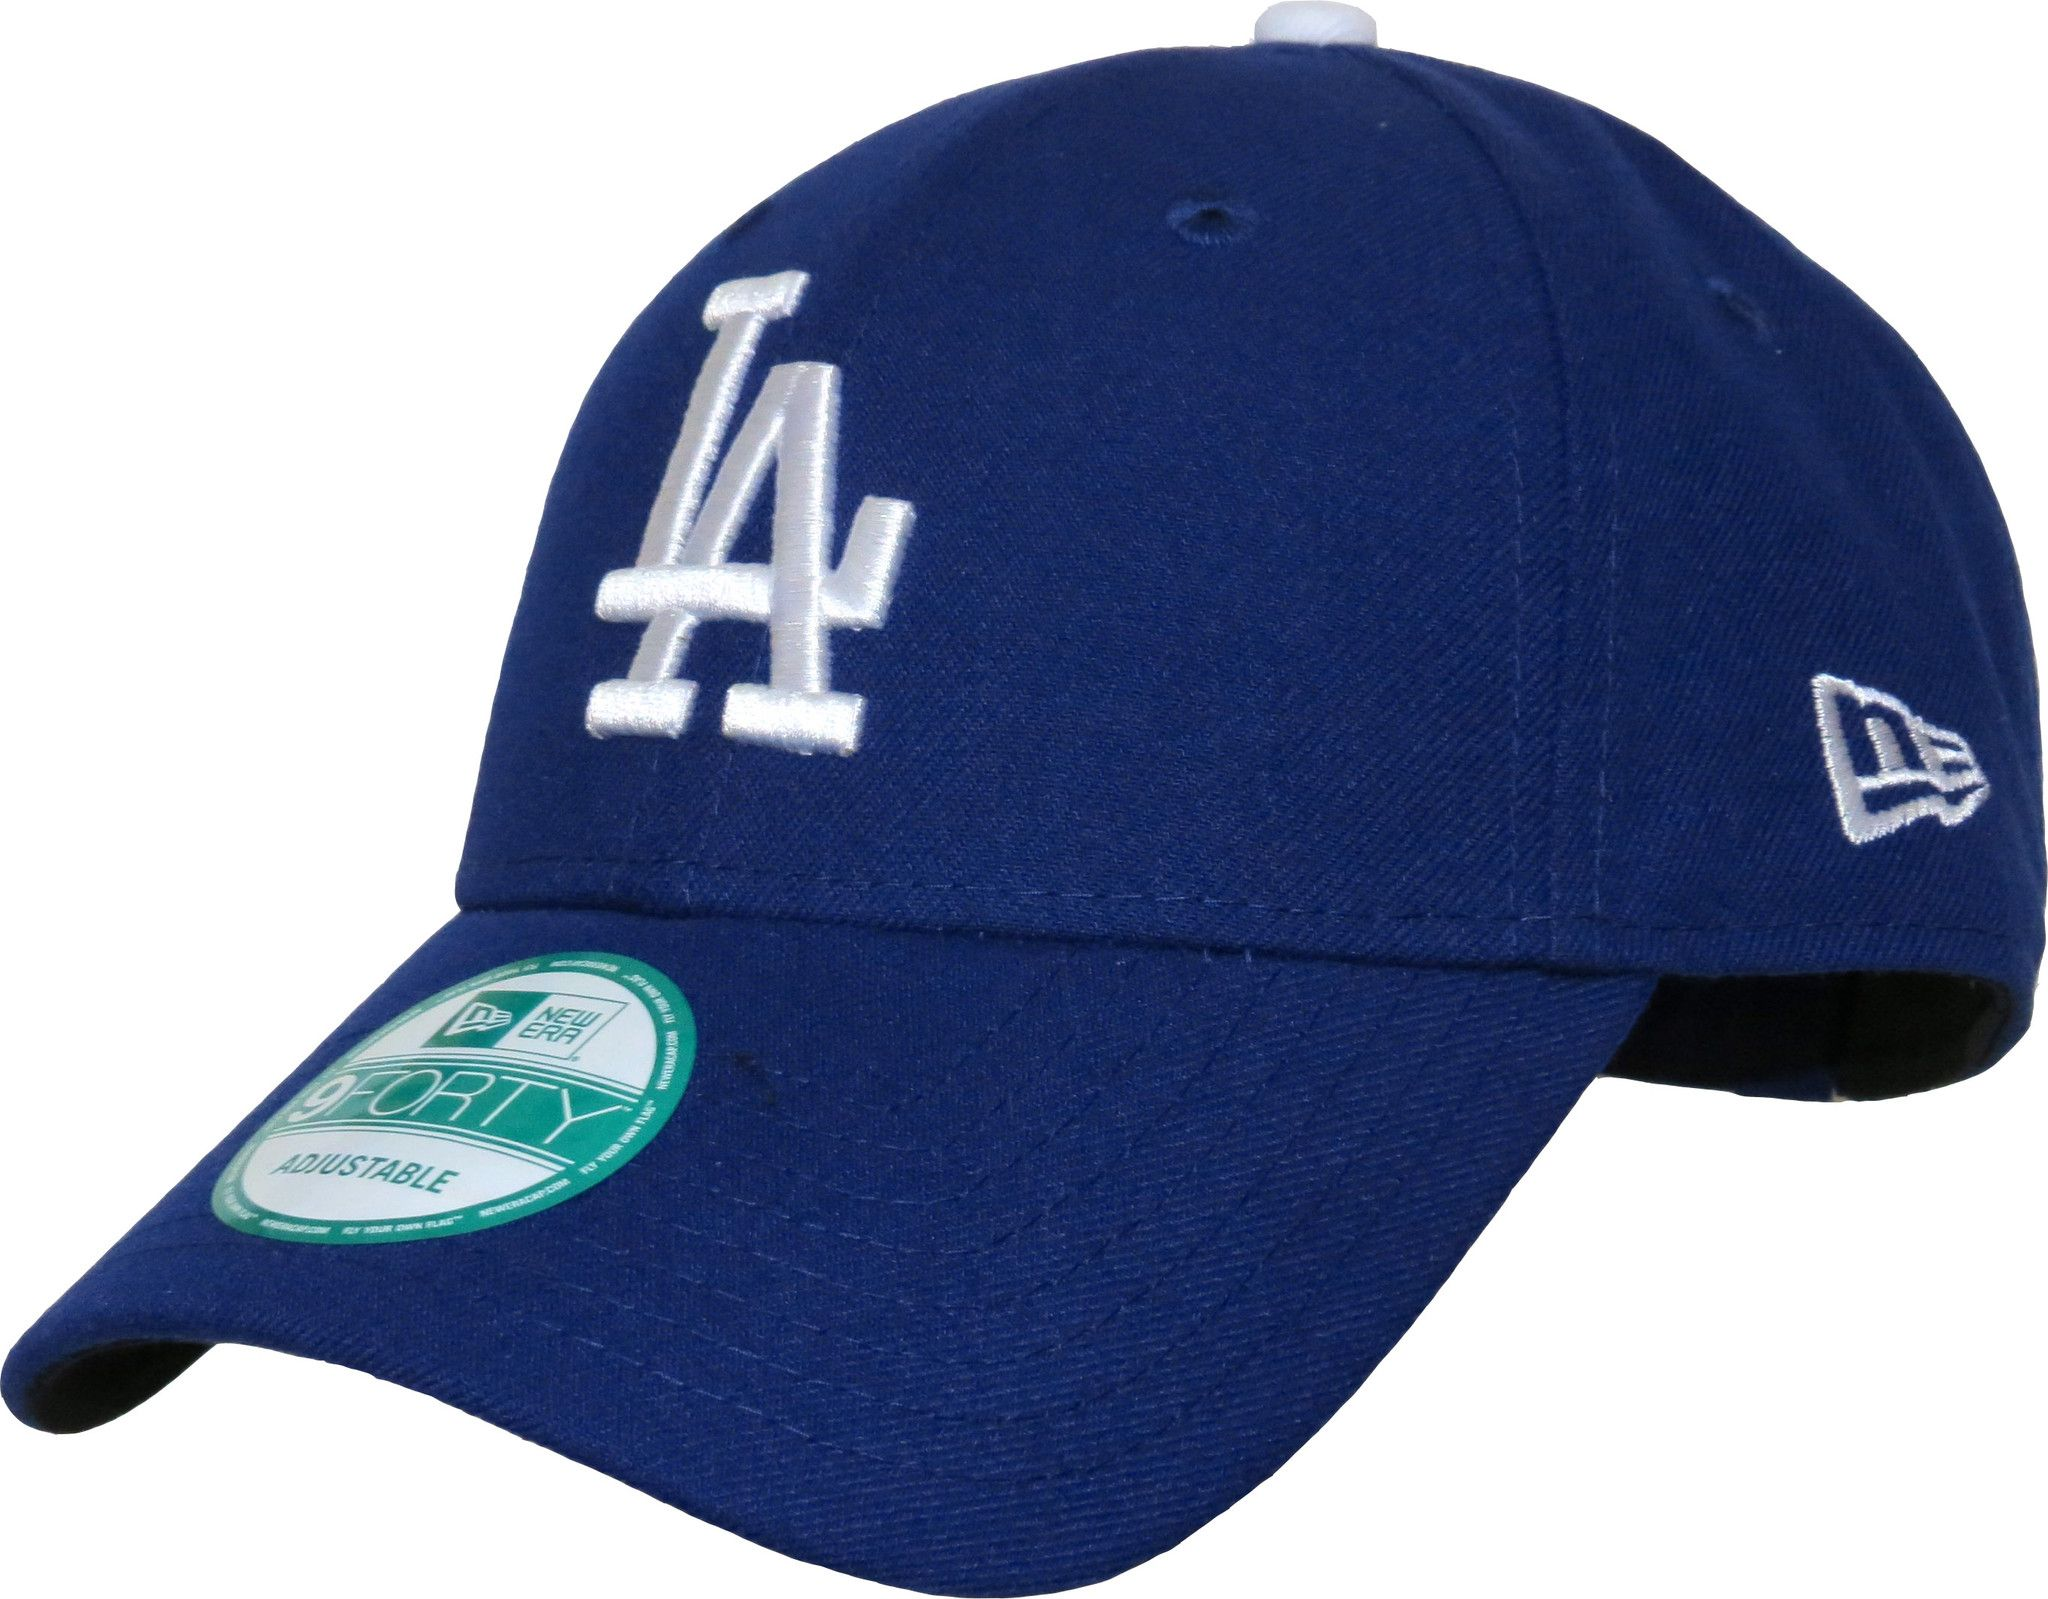 405571965b4 Los Angeles Dodgers New Era 940 The League Pinch Hitter Baseball Cap ...